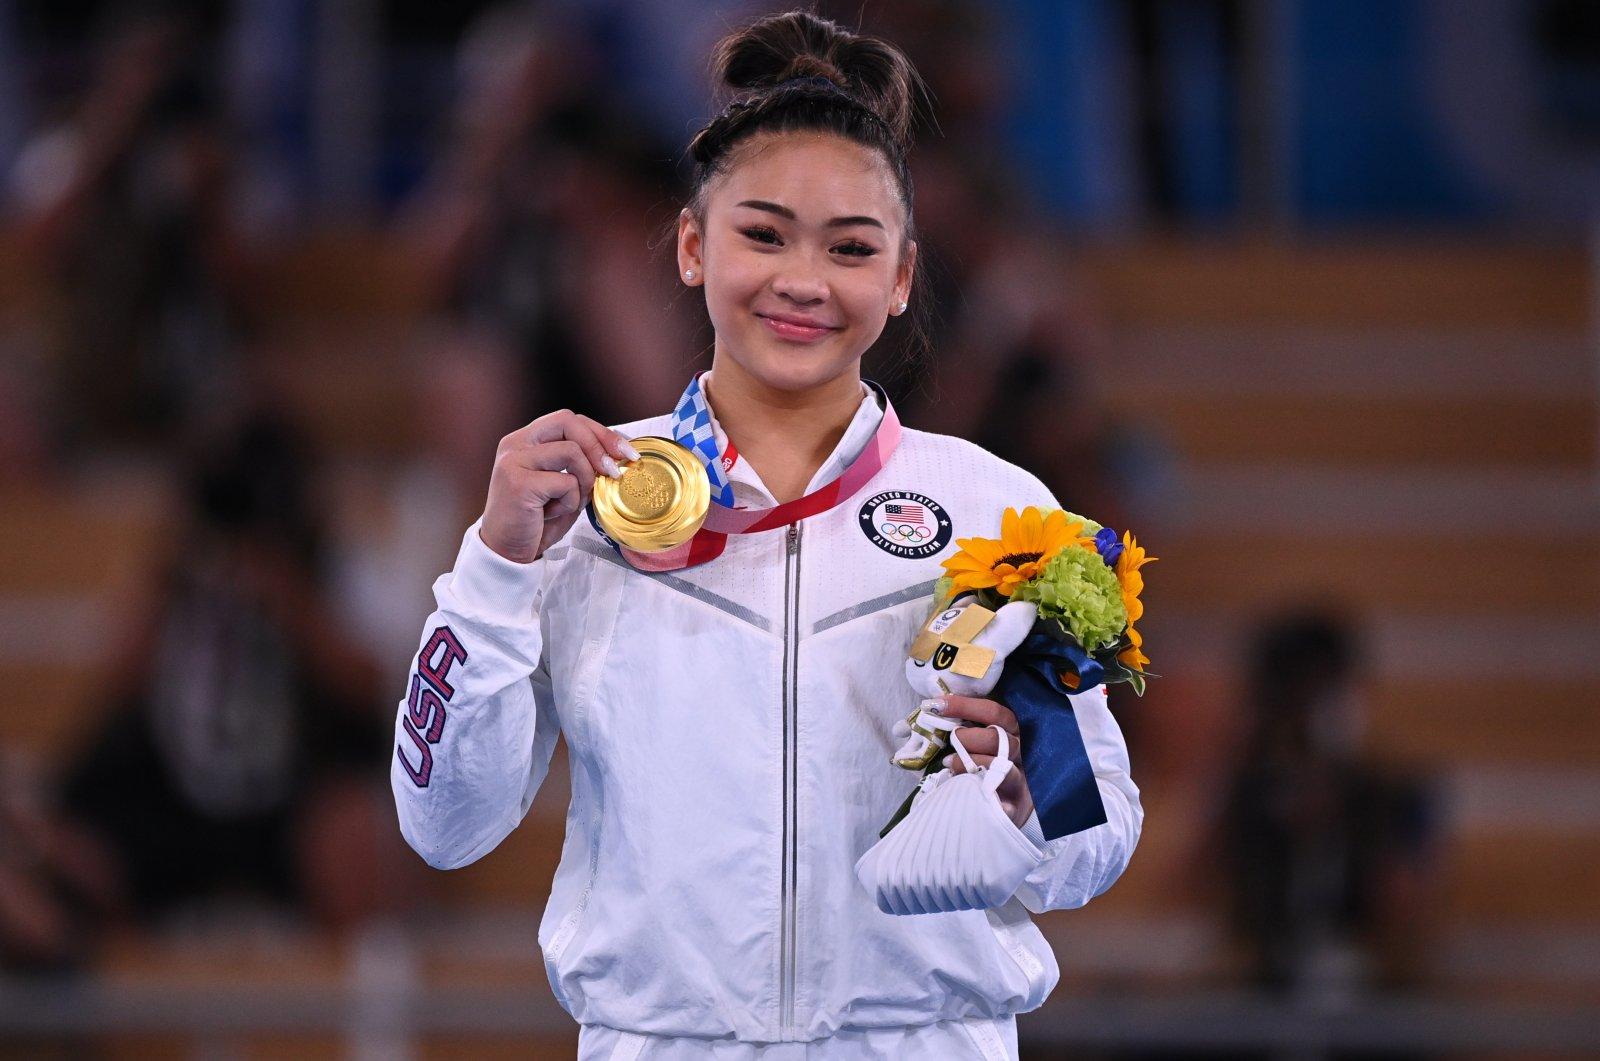 U.S.'s Sunisa Lee pose with the Tokyo 2020 Olympics gymnasticswomen's individual all-around gold, Ariake Gymnastics Center, Tokyo, Japan, July 29, 2021.